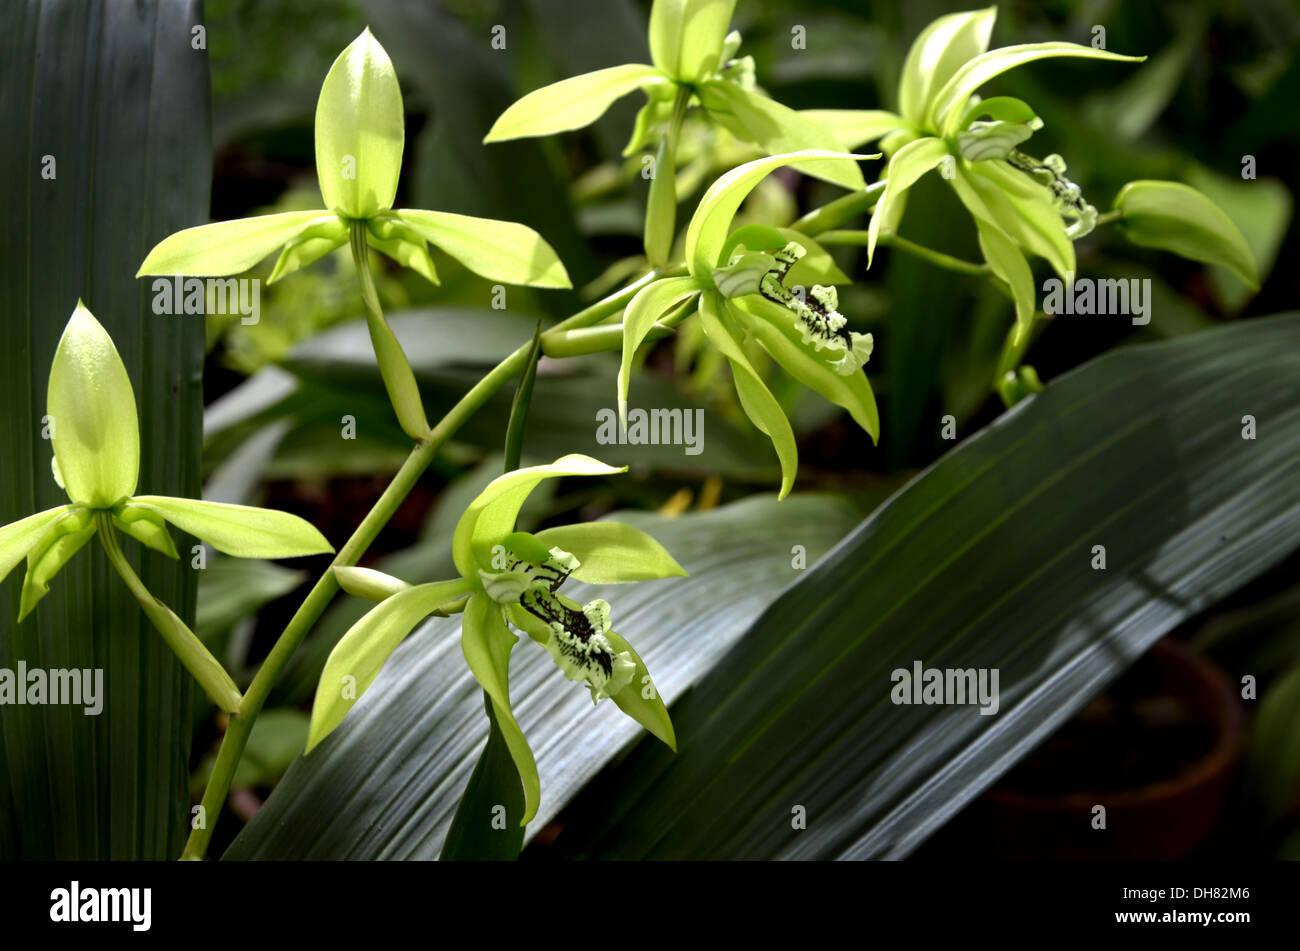 schwarze orchidee aus borneo stockfoto bild 62258006 alamy. Black Bedroom Furniture Sets. Home Design Ideas